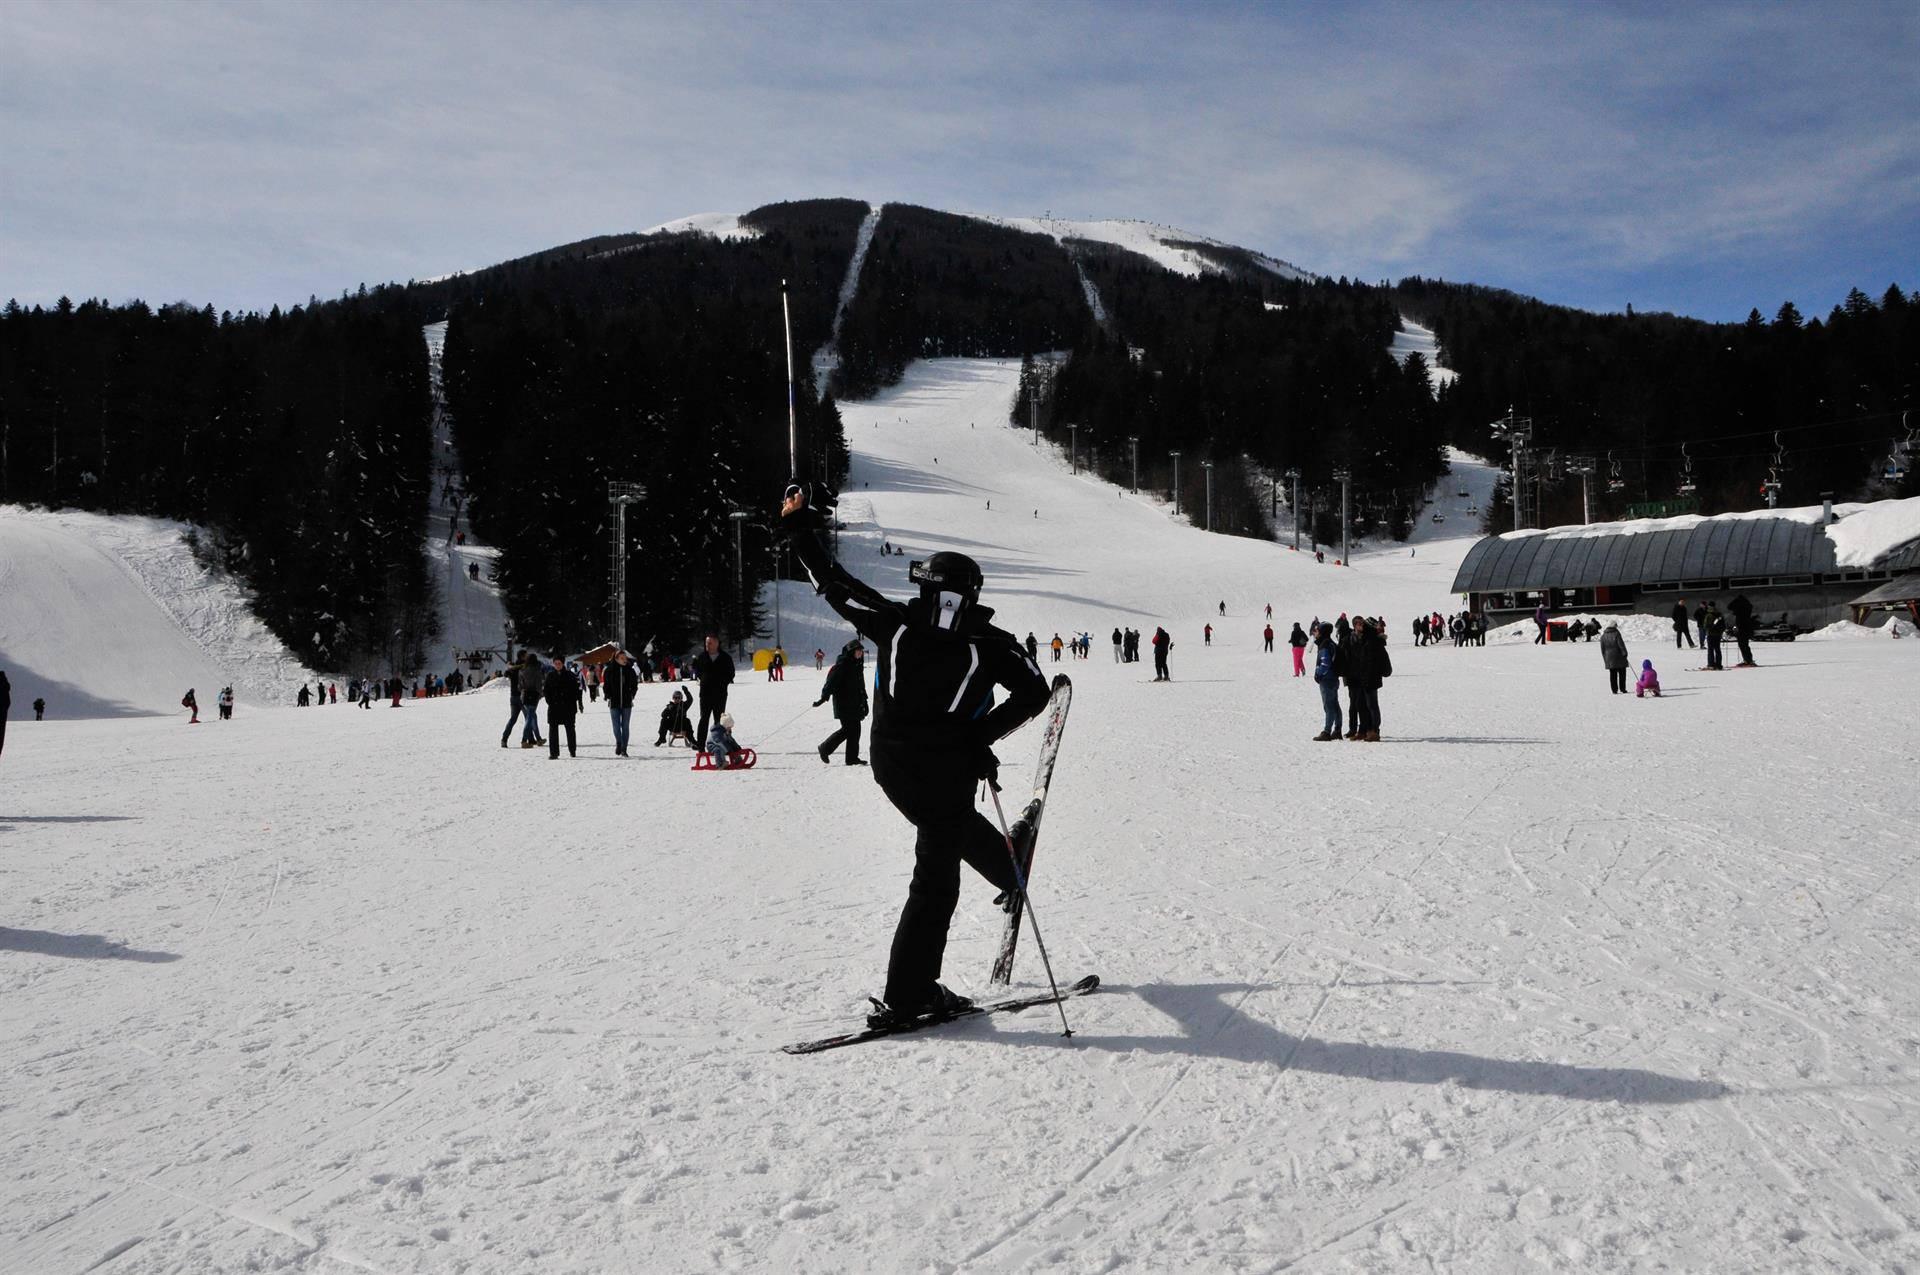 bjelasnica-igman-ski-sezona-aa_picture_20150221_4604770_high